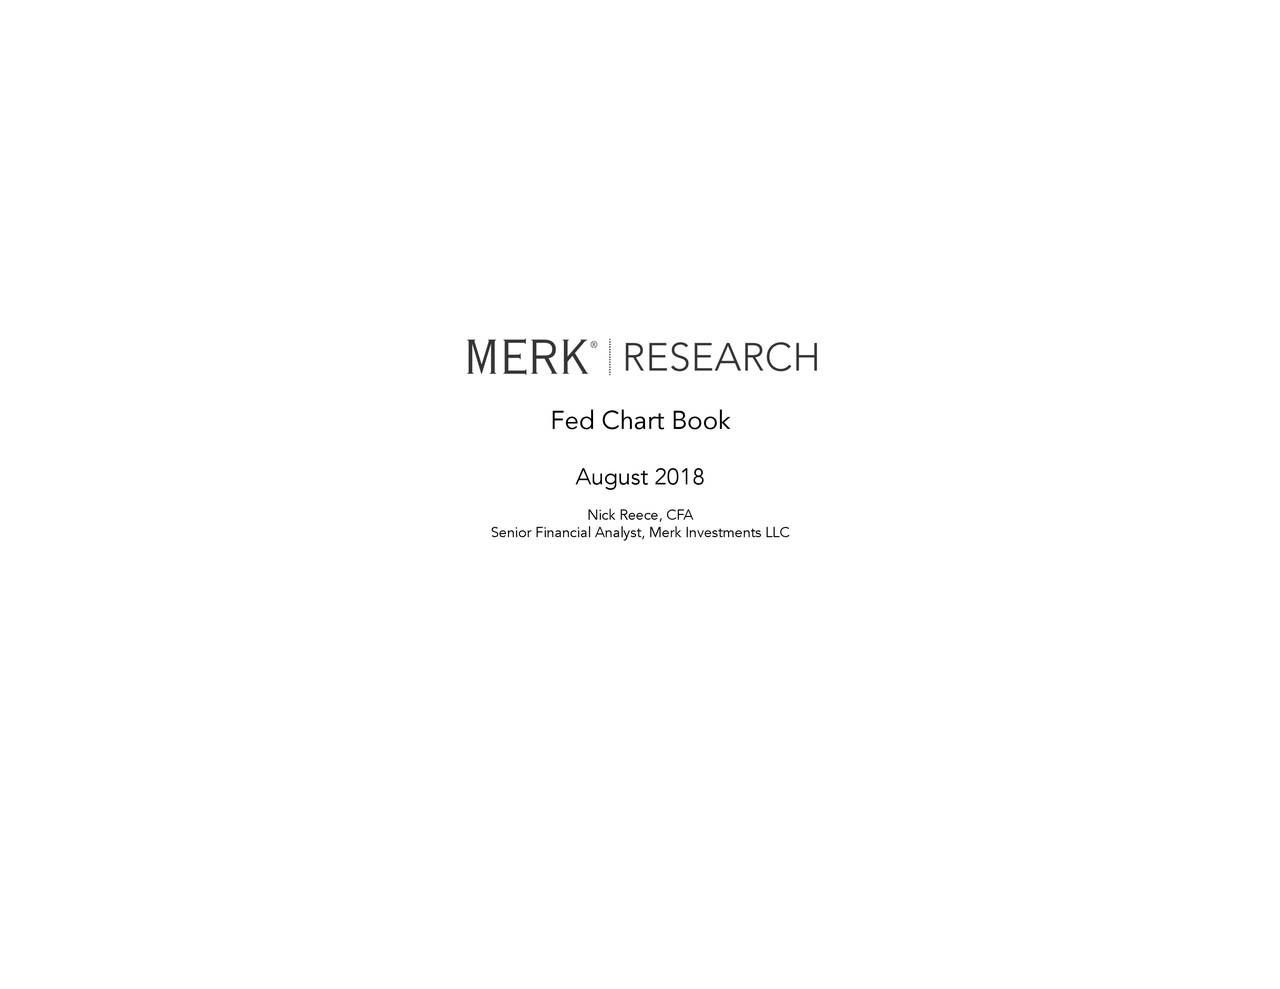 August 2018 Nick Reece, CFA Senior Financial Analyst, Merk Investments LLC